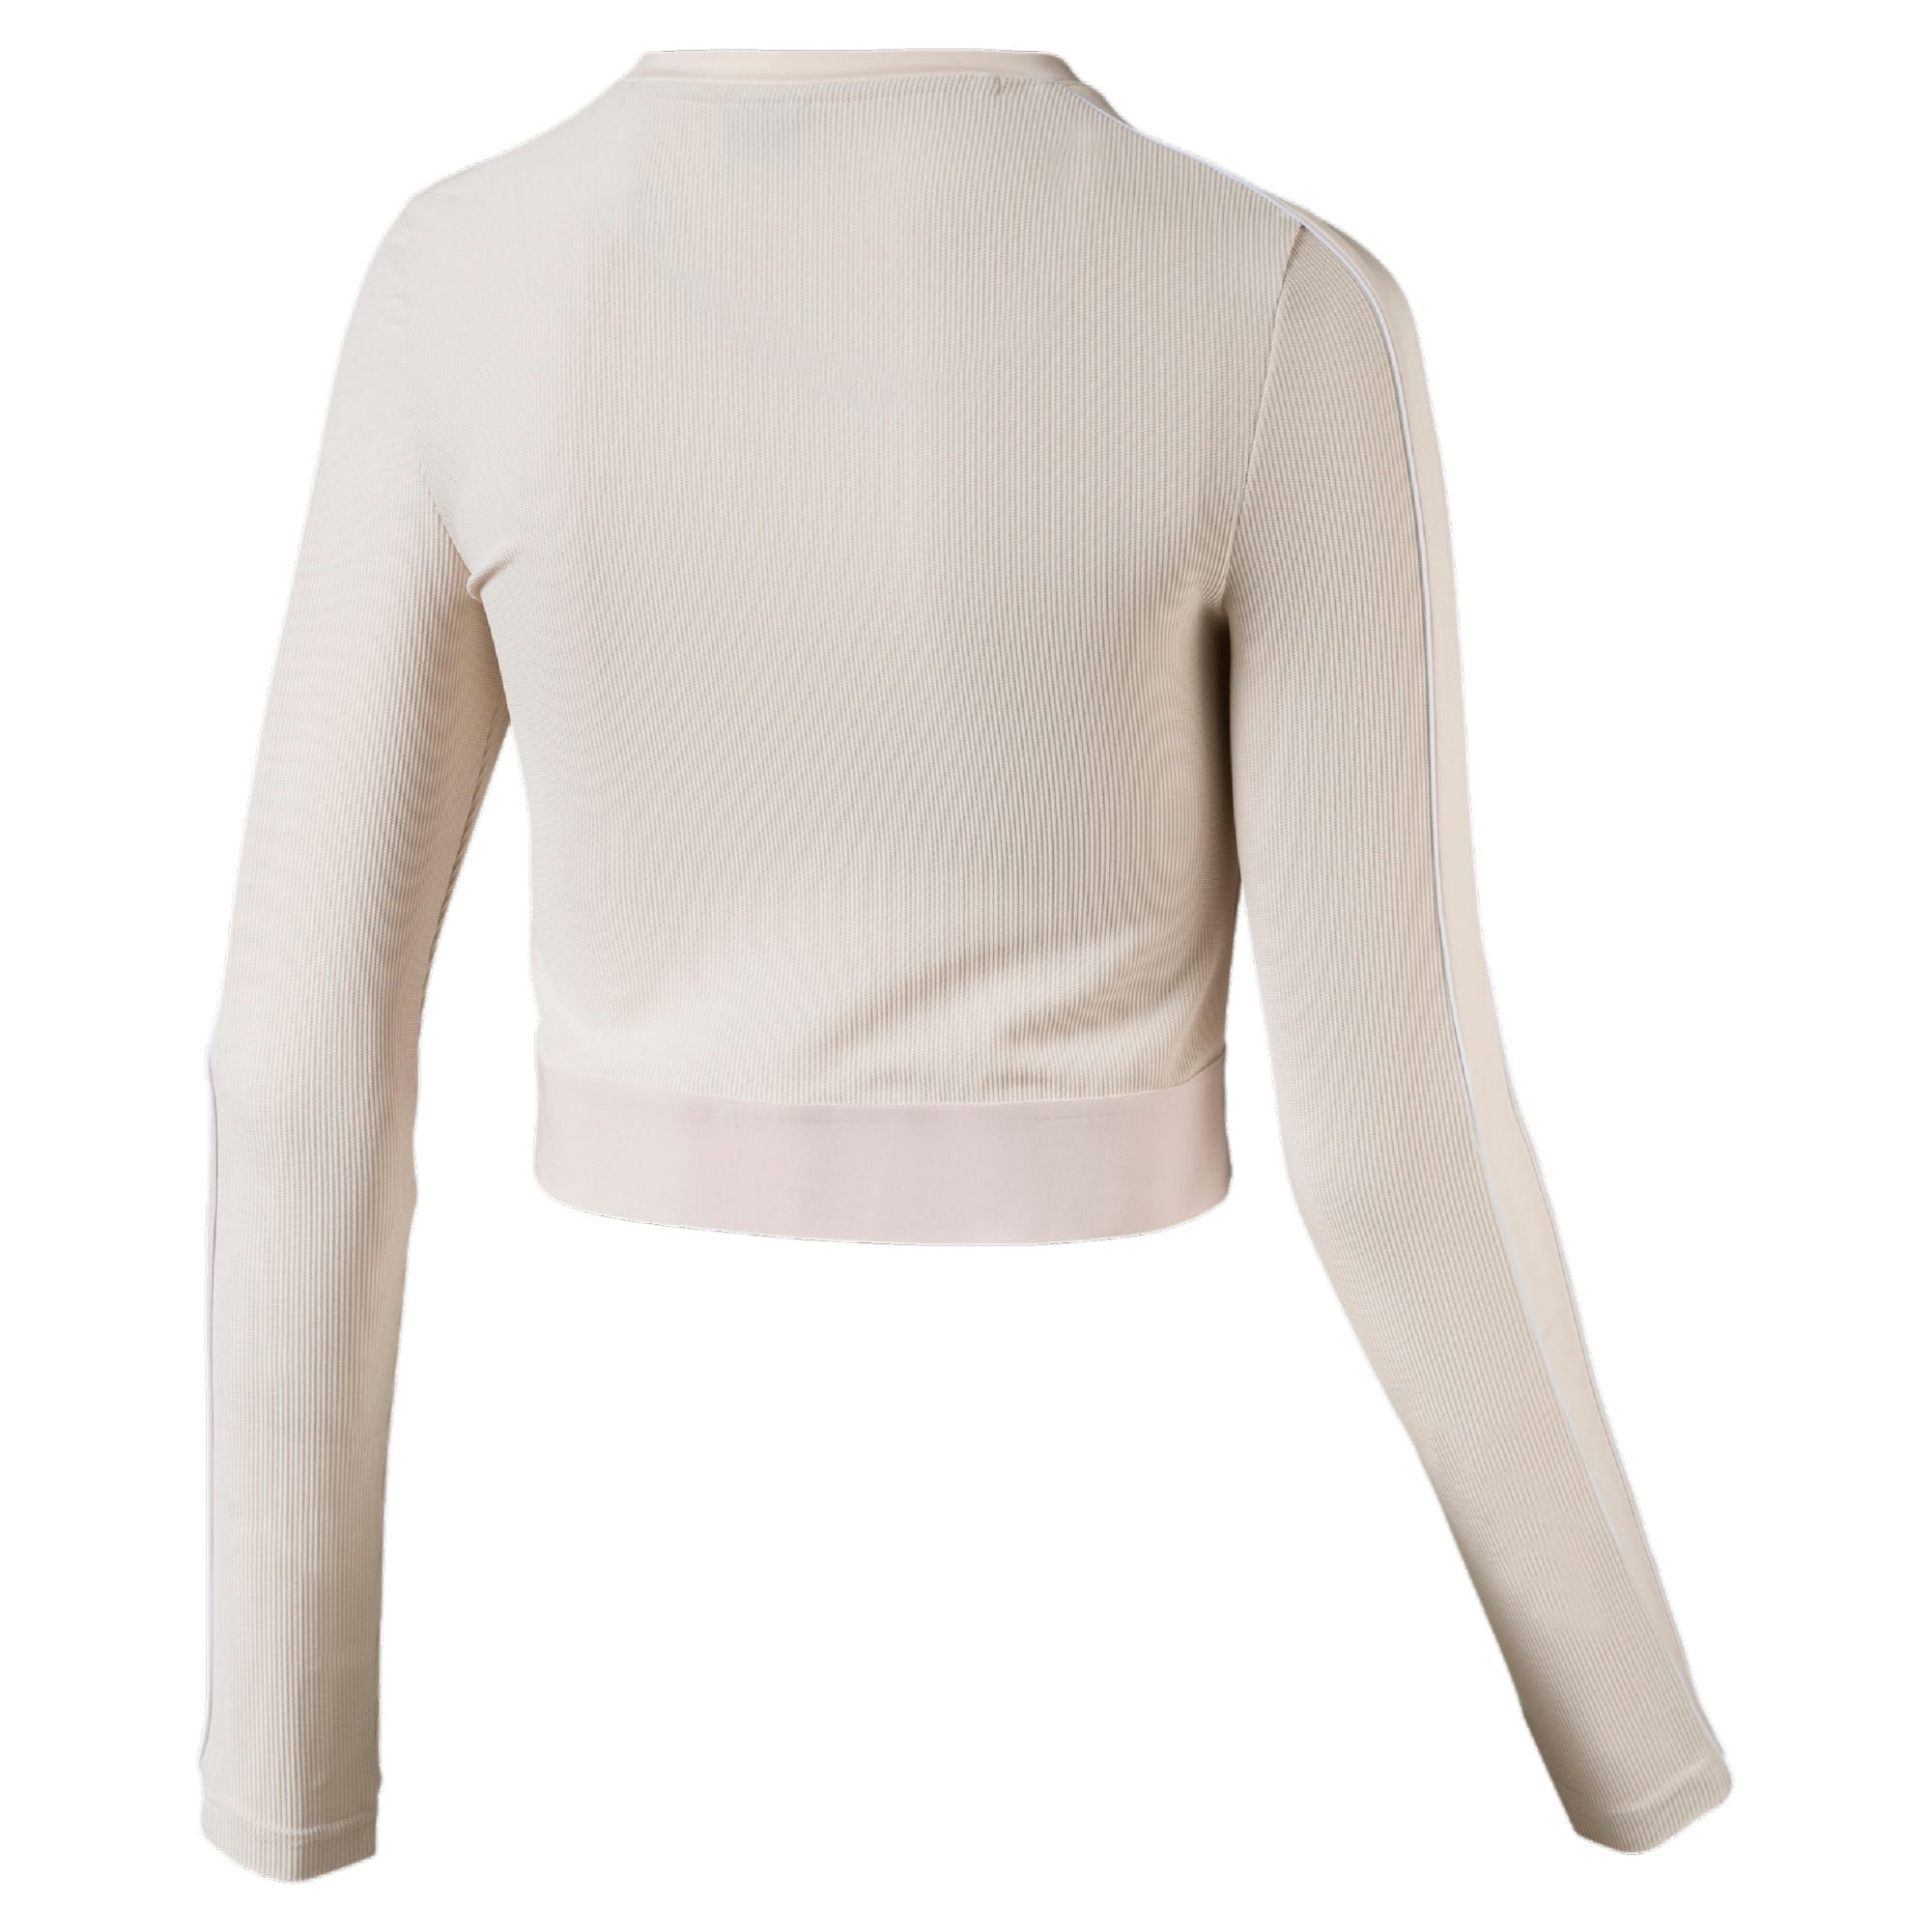 Thumbnail 5 of Classics Women's Long Sleeve Crop Top, Pastel Parchment, medium